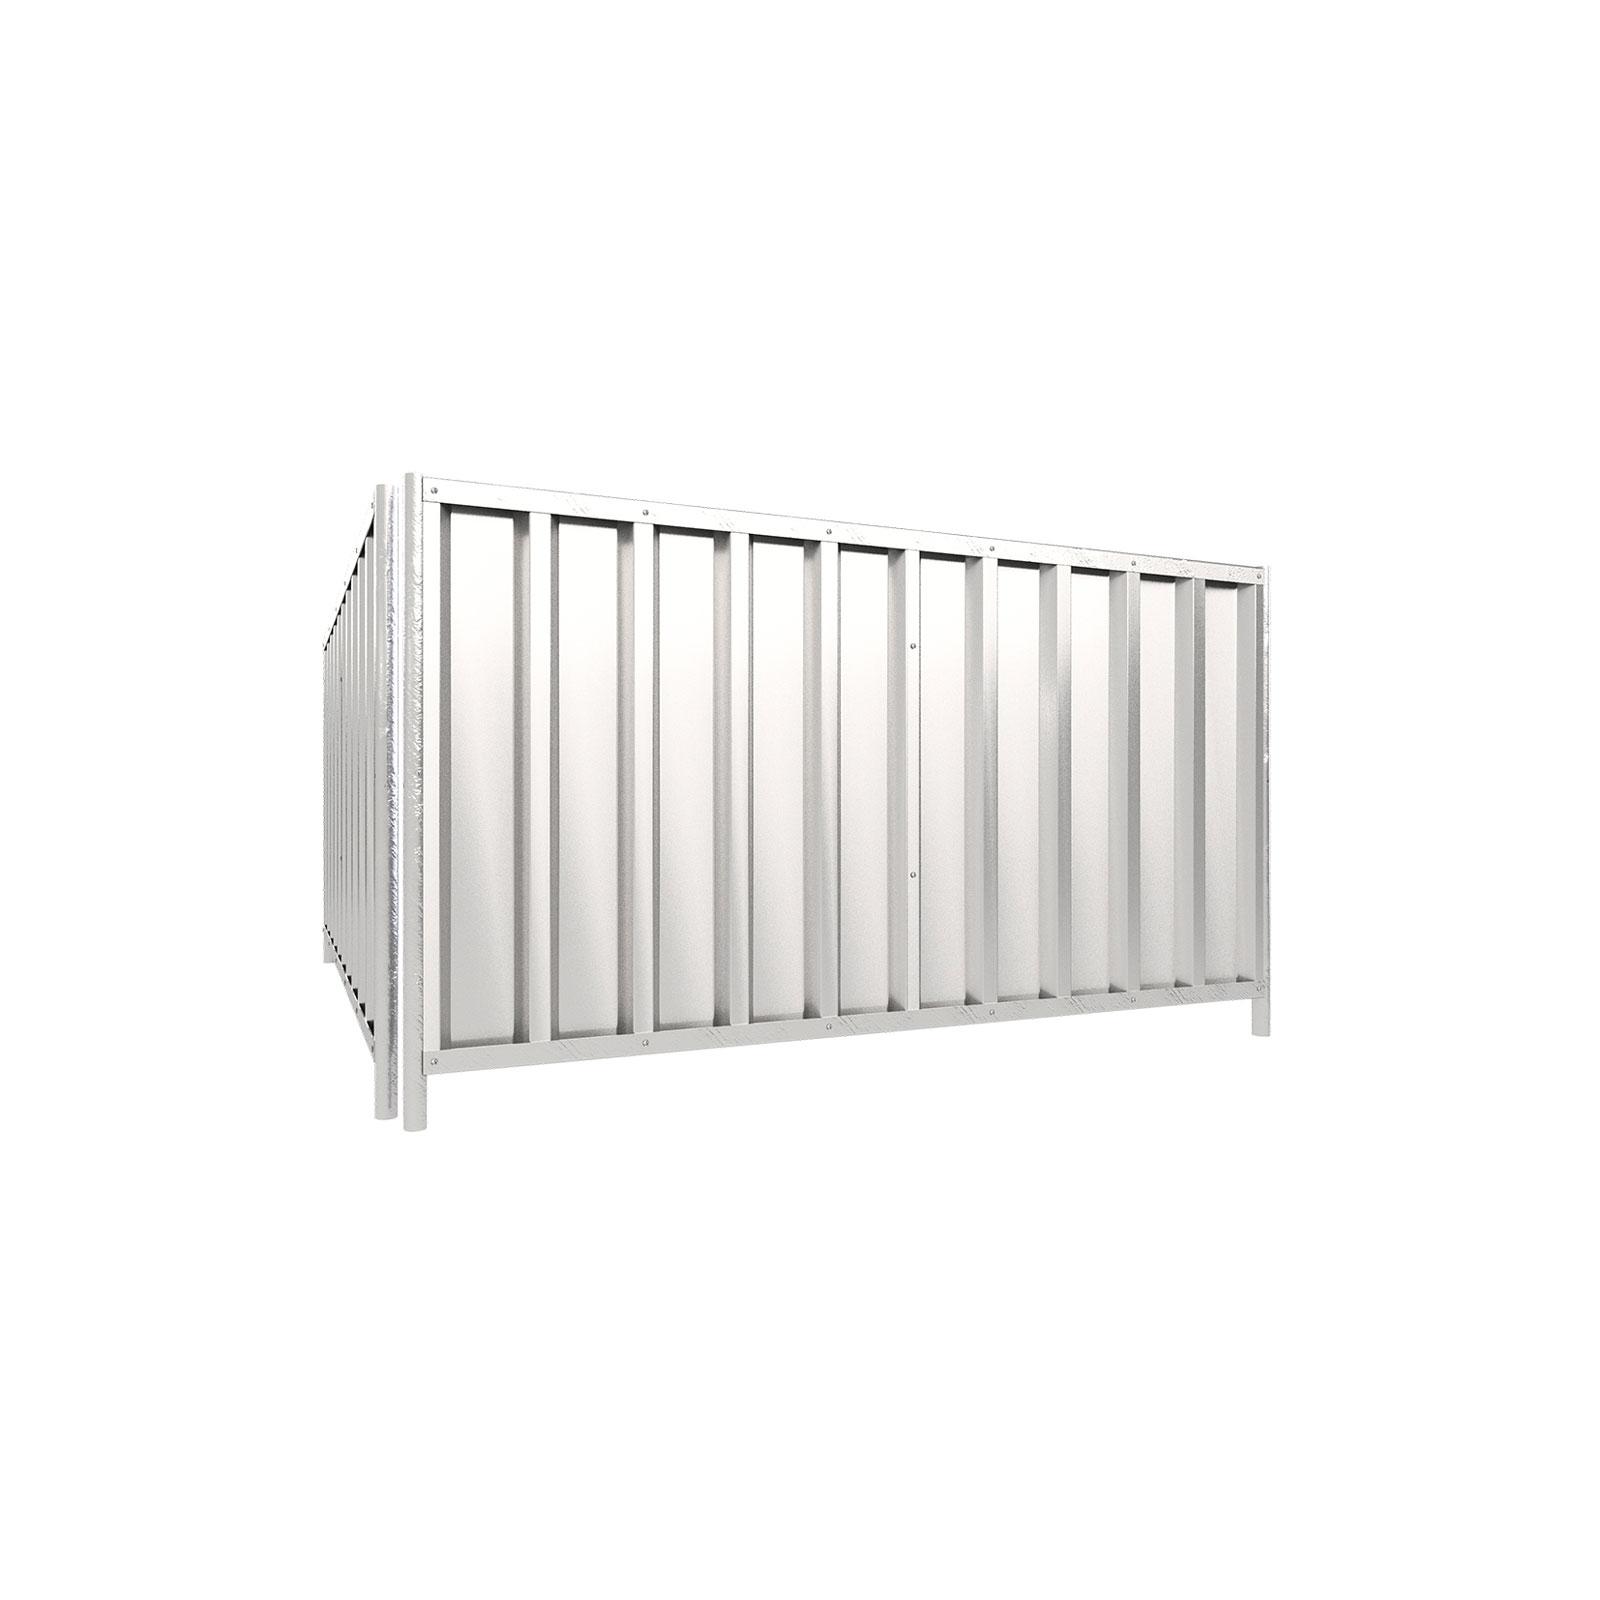 Schake Mobilzaun Trapez 2,2x1,2m mit Stahlblechfüllung, rot 3B1222R